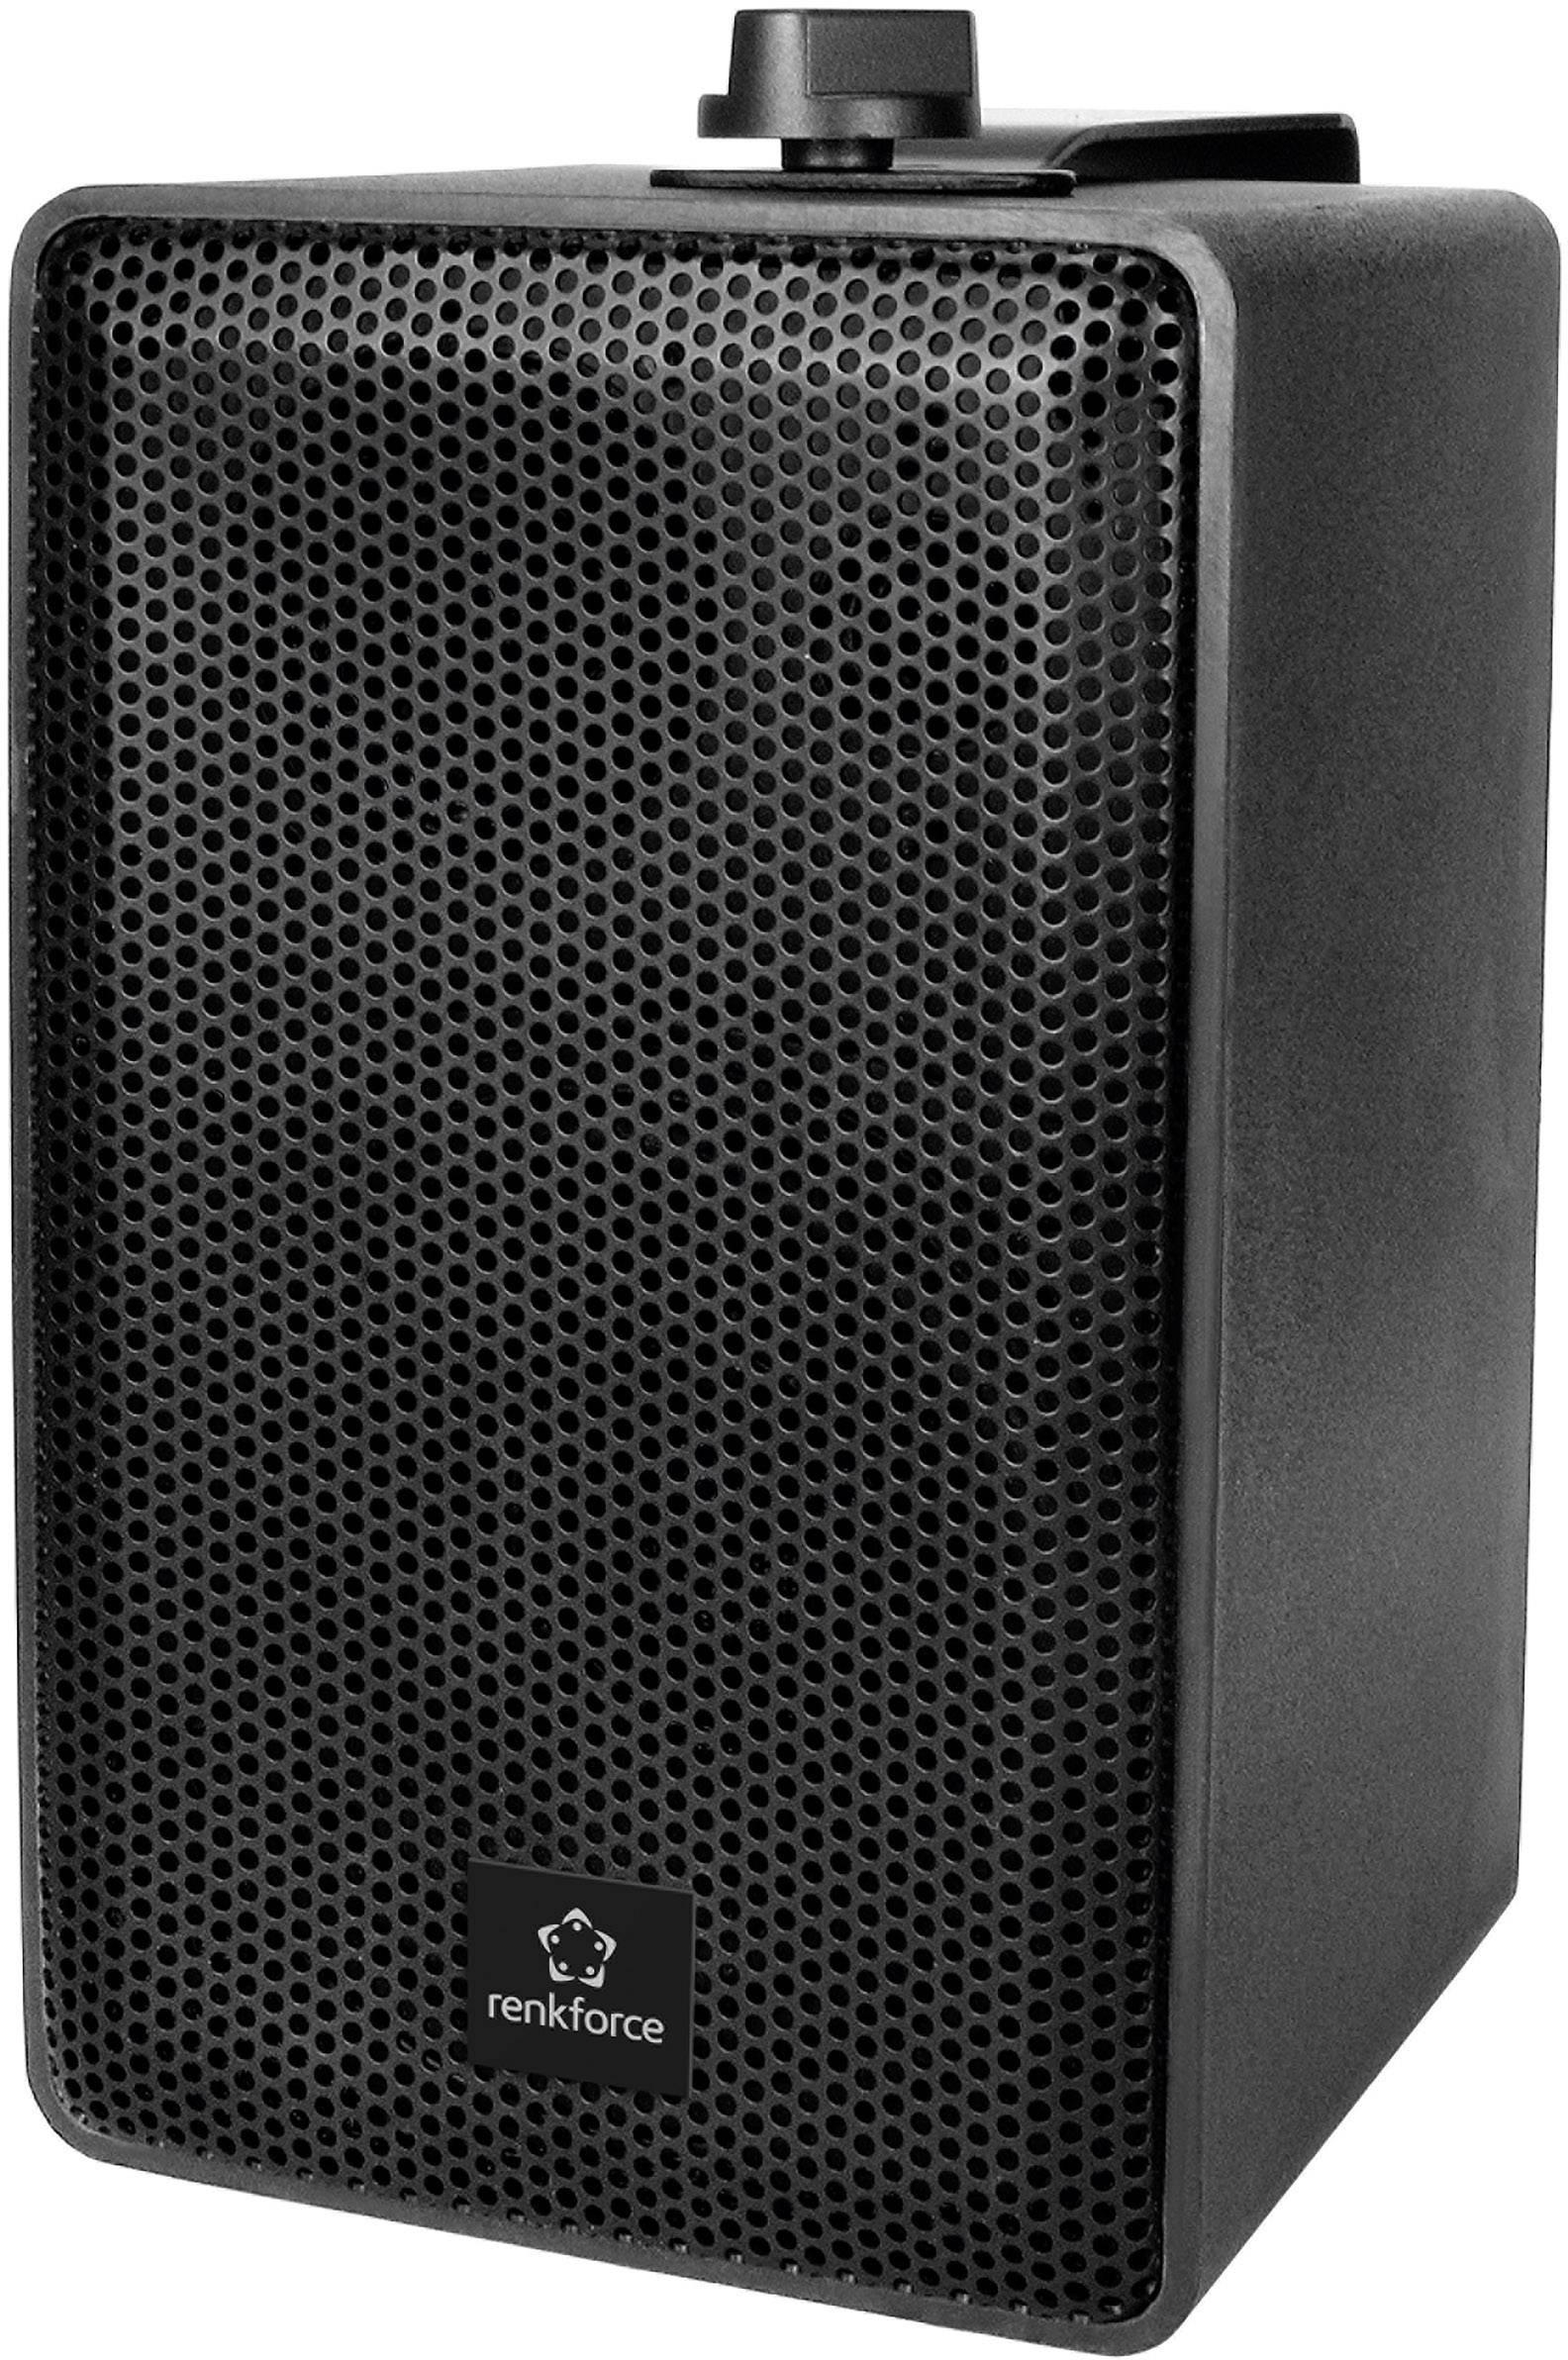 Regálový reproduktor Renkforce RL100W BK, 90 do 20000 Hz, 100 W, 1 pár, čierna